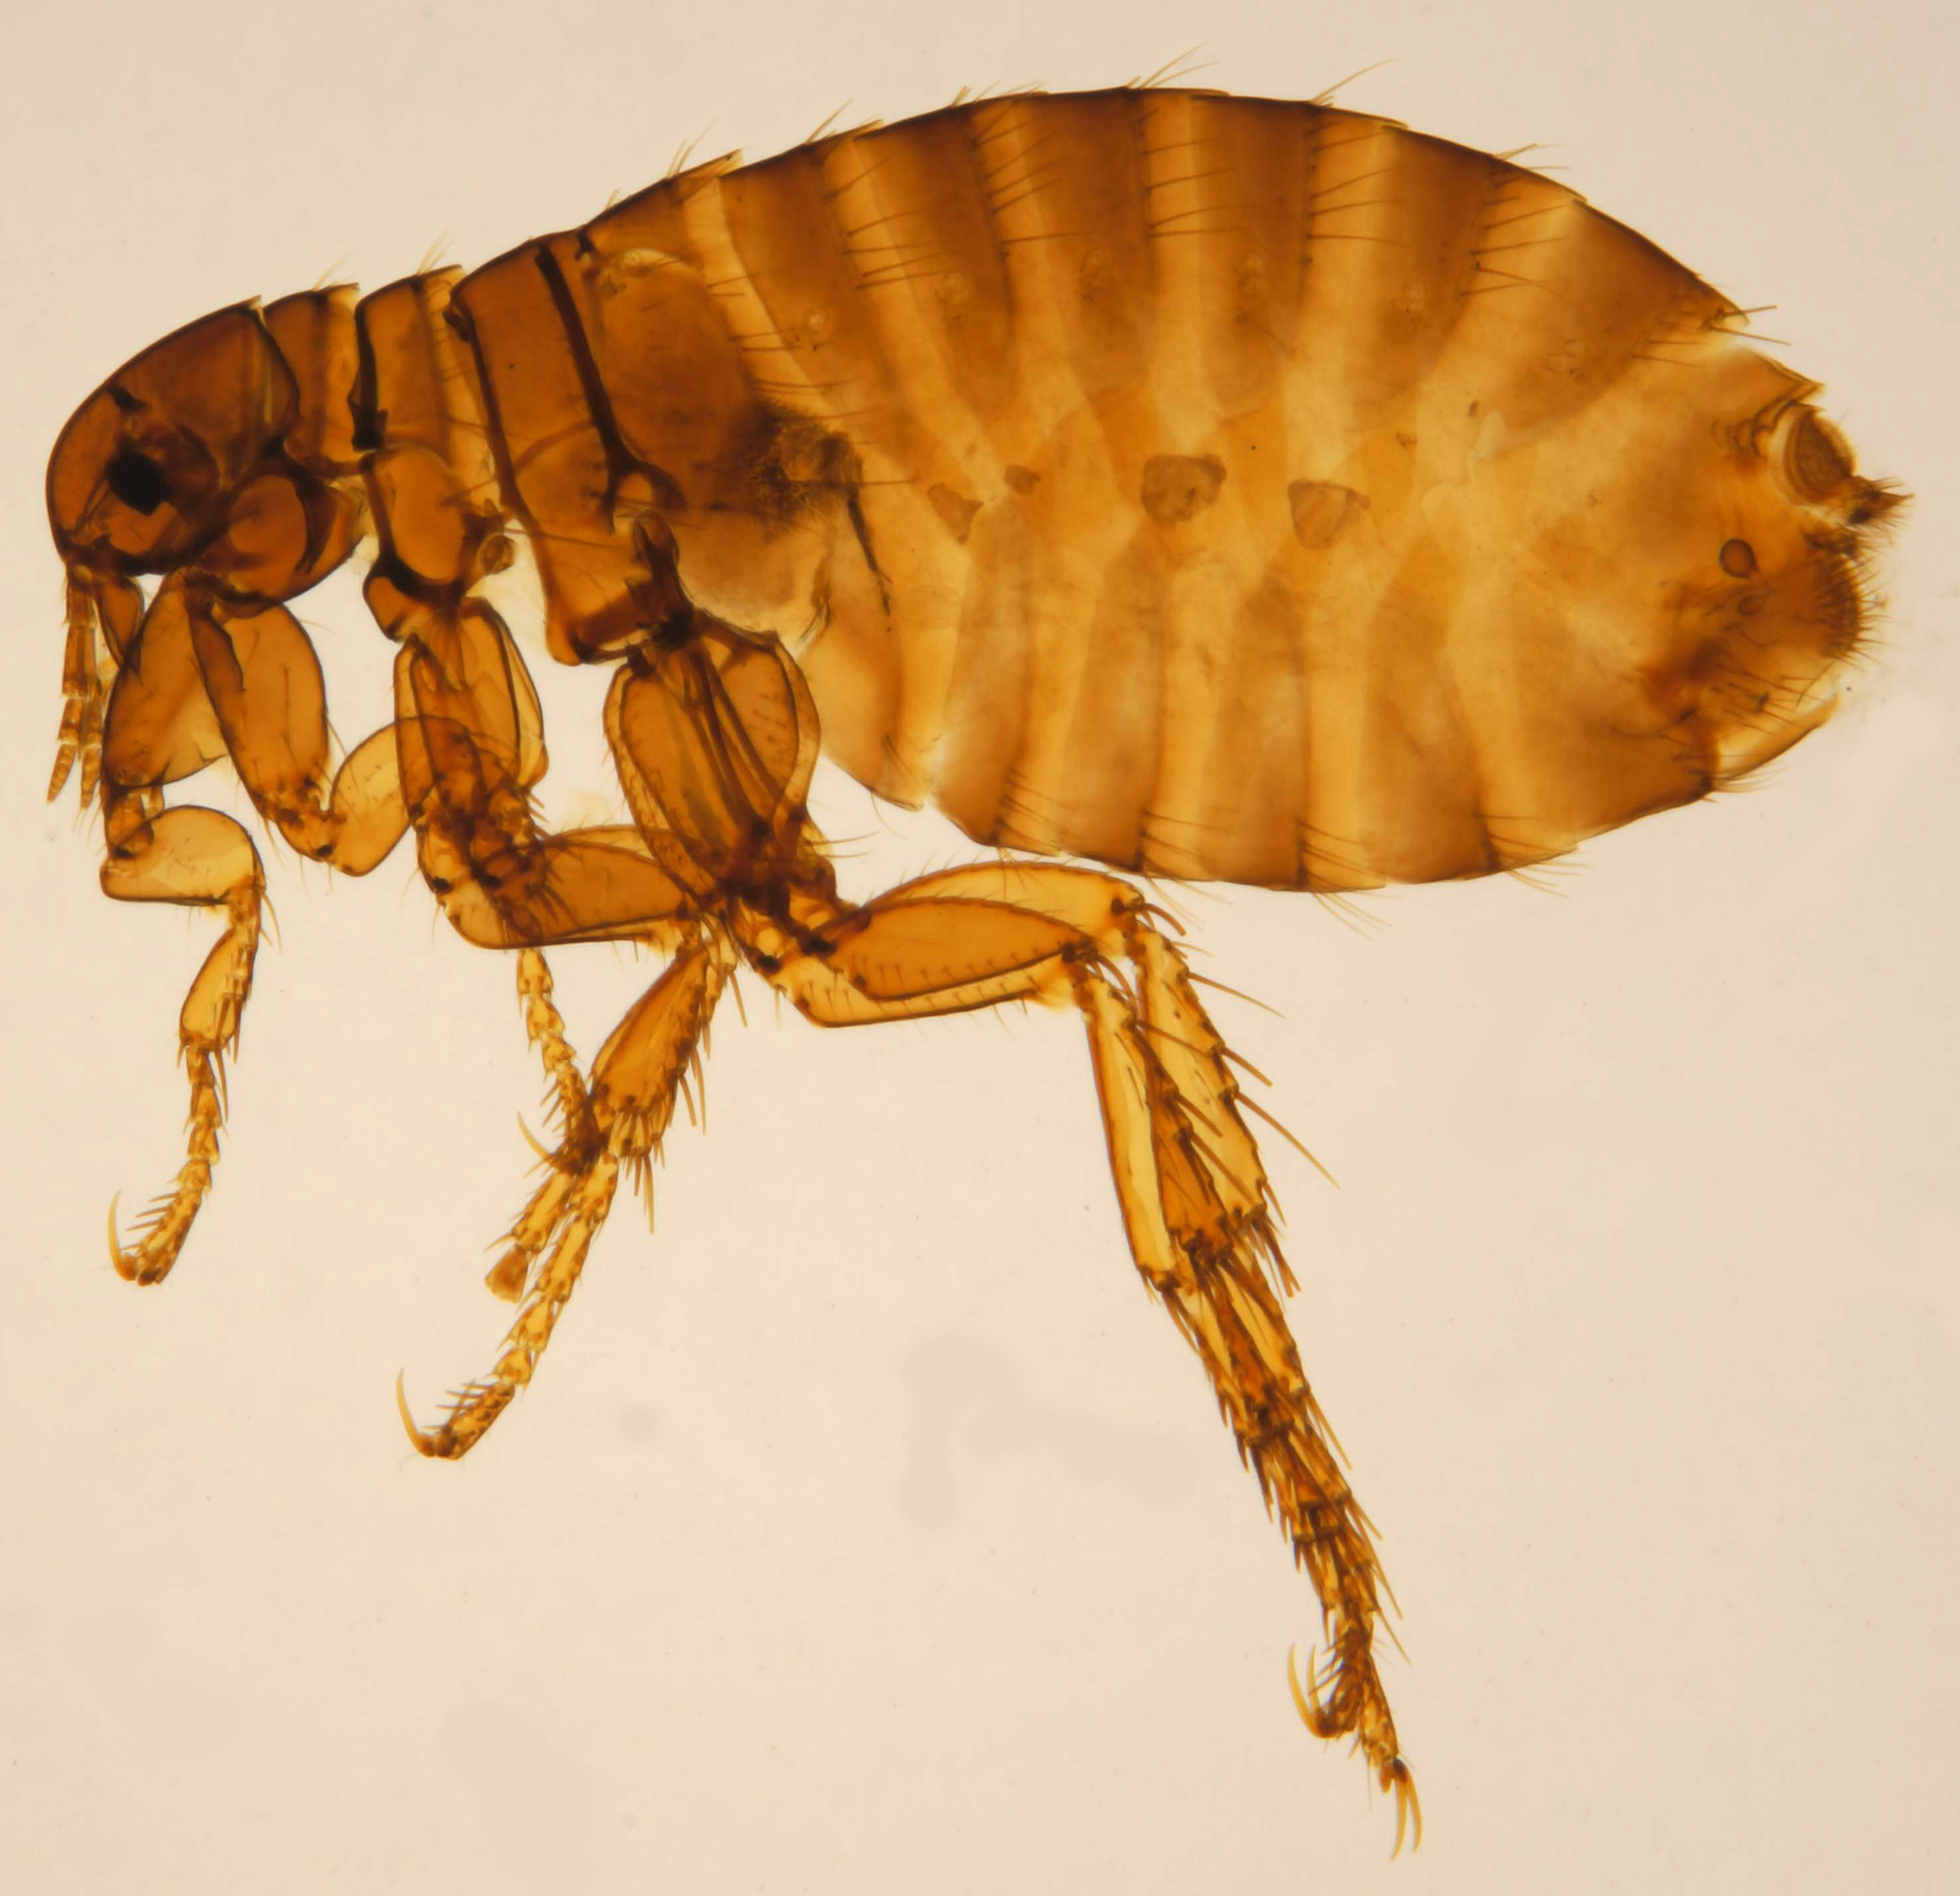 Cat Flea Human Disease